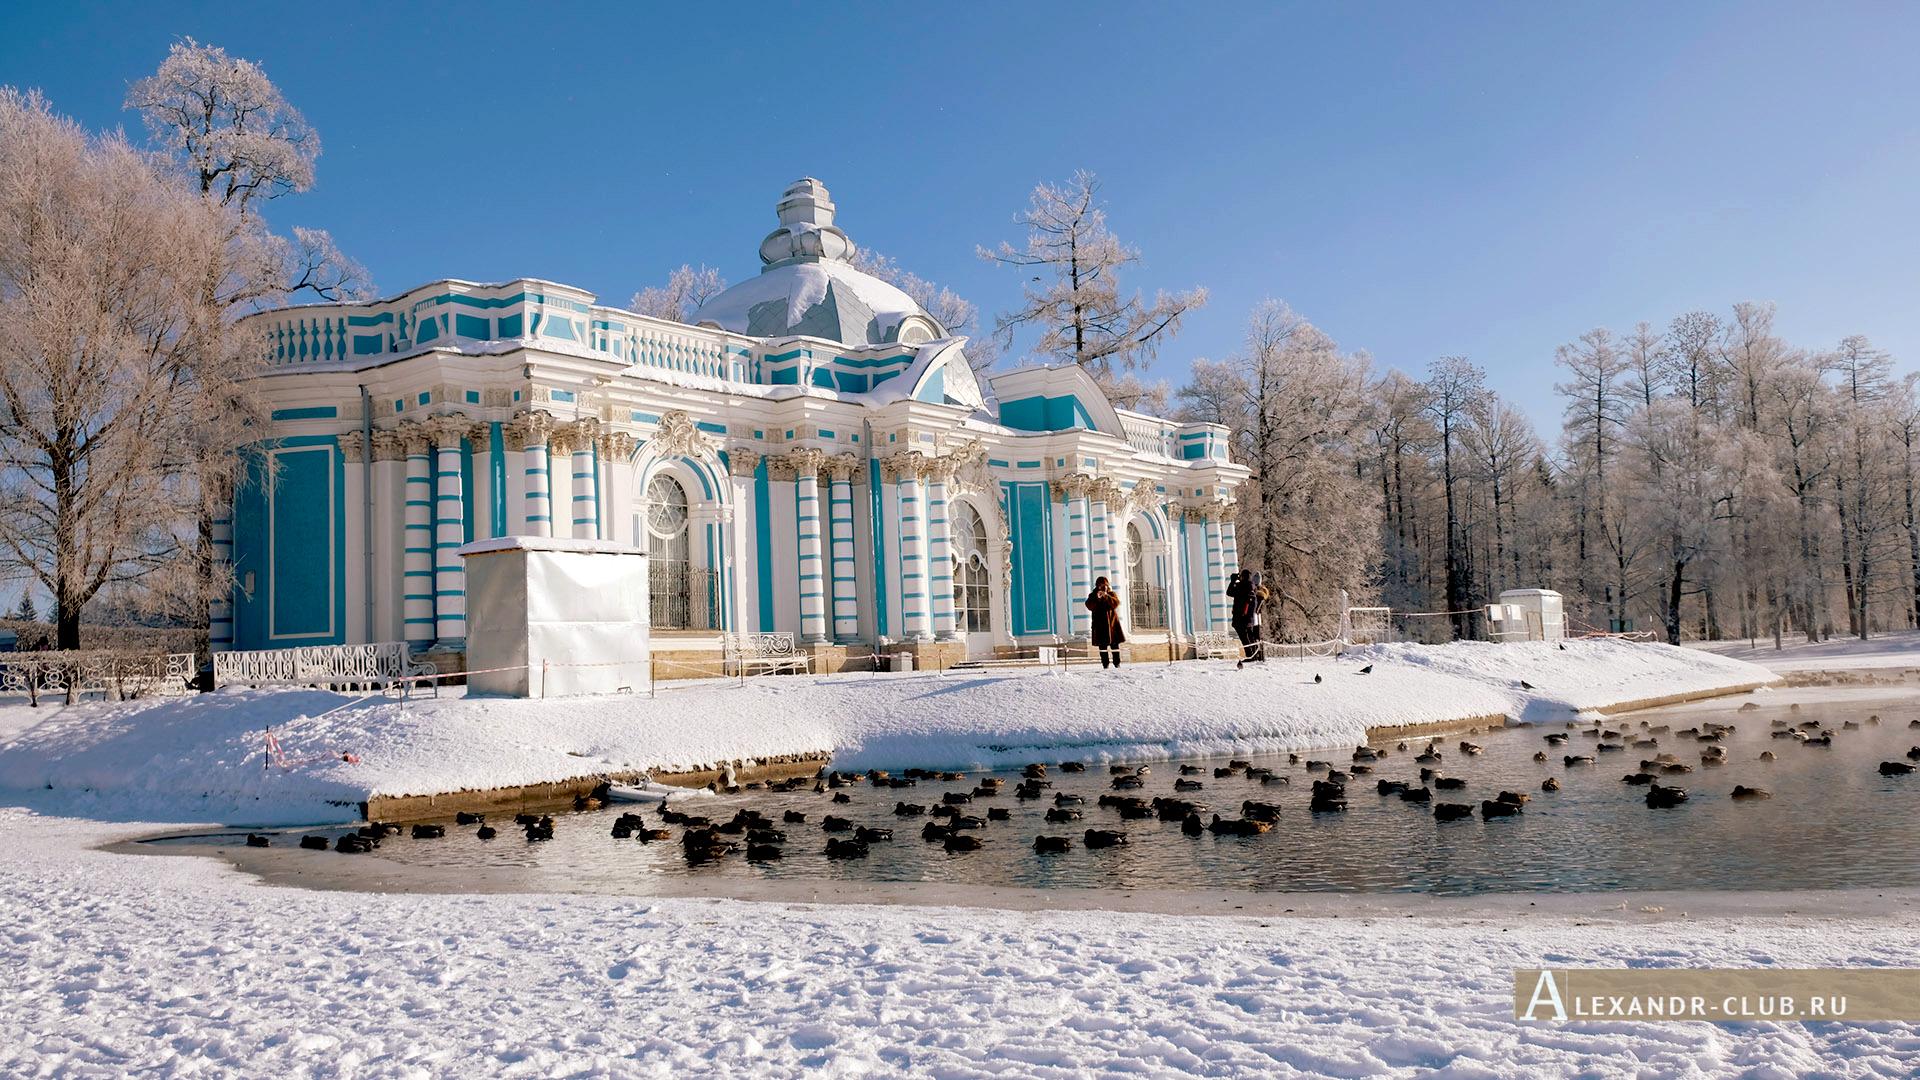 Царское Село, зима, Екатерининский парк, павильон «Грот»